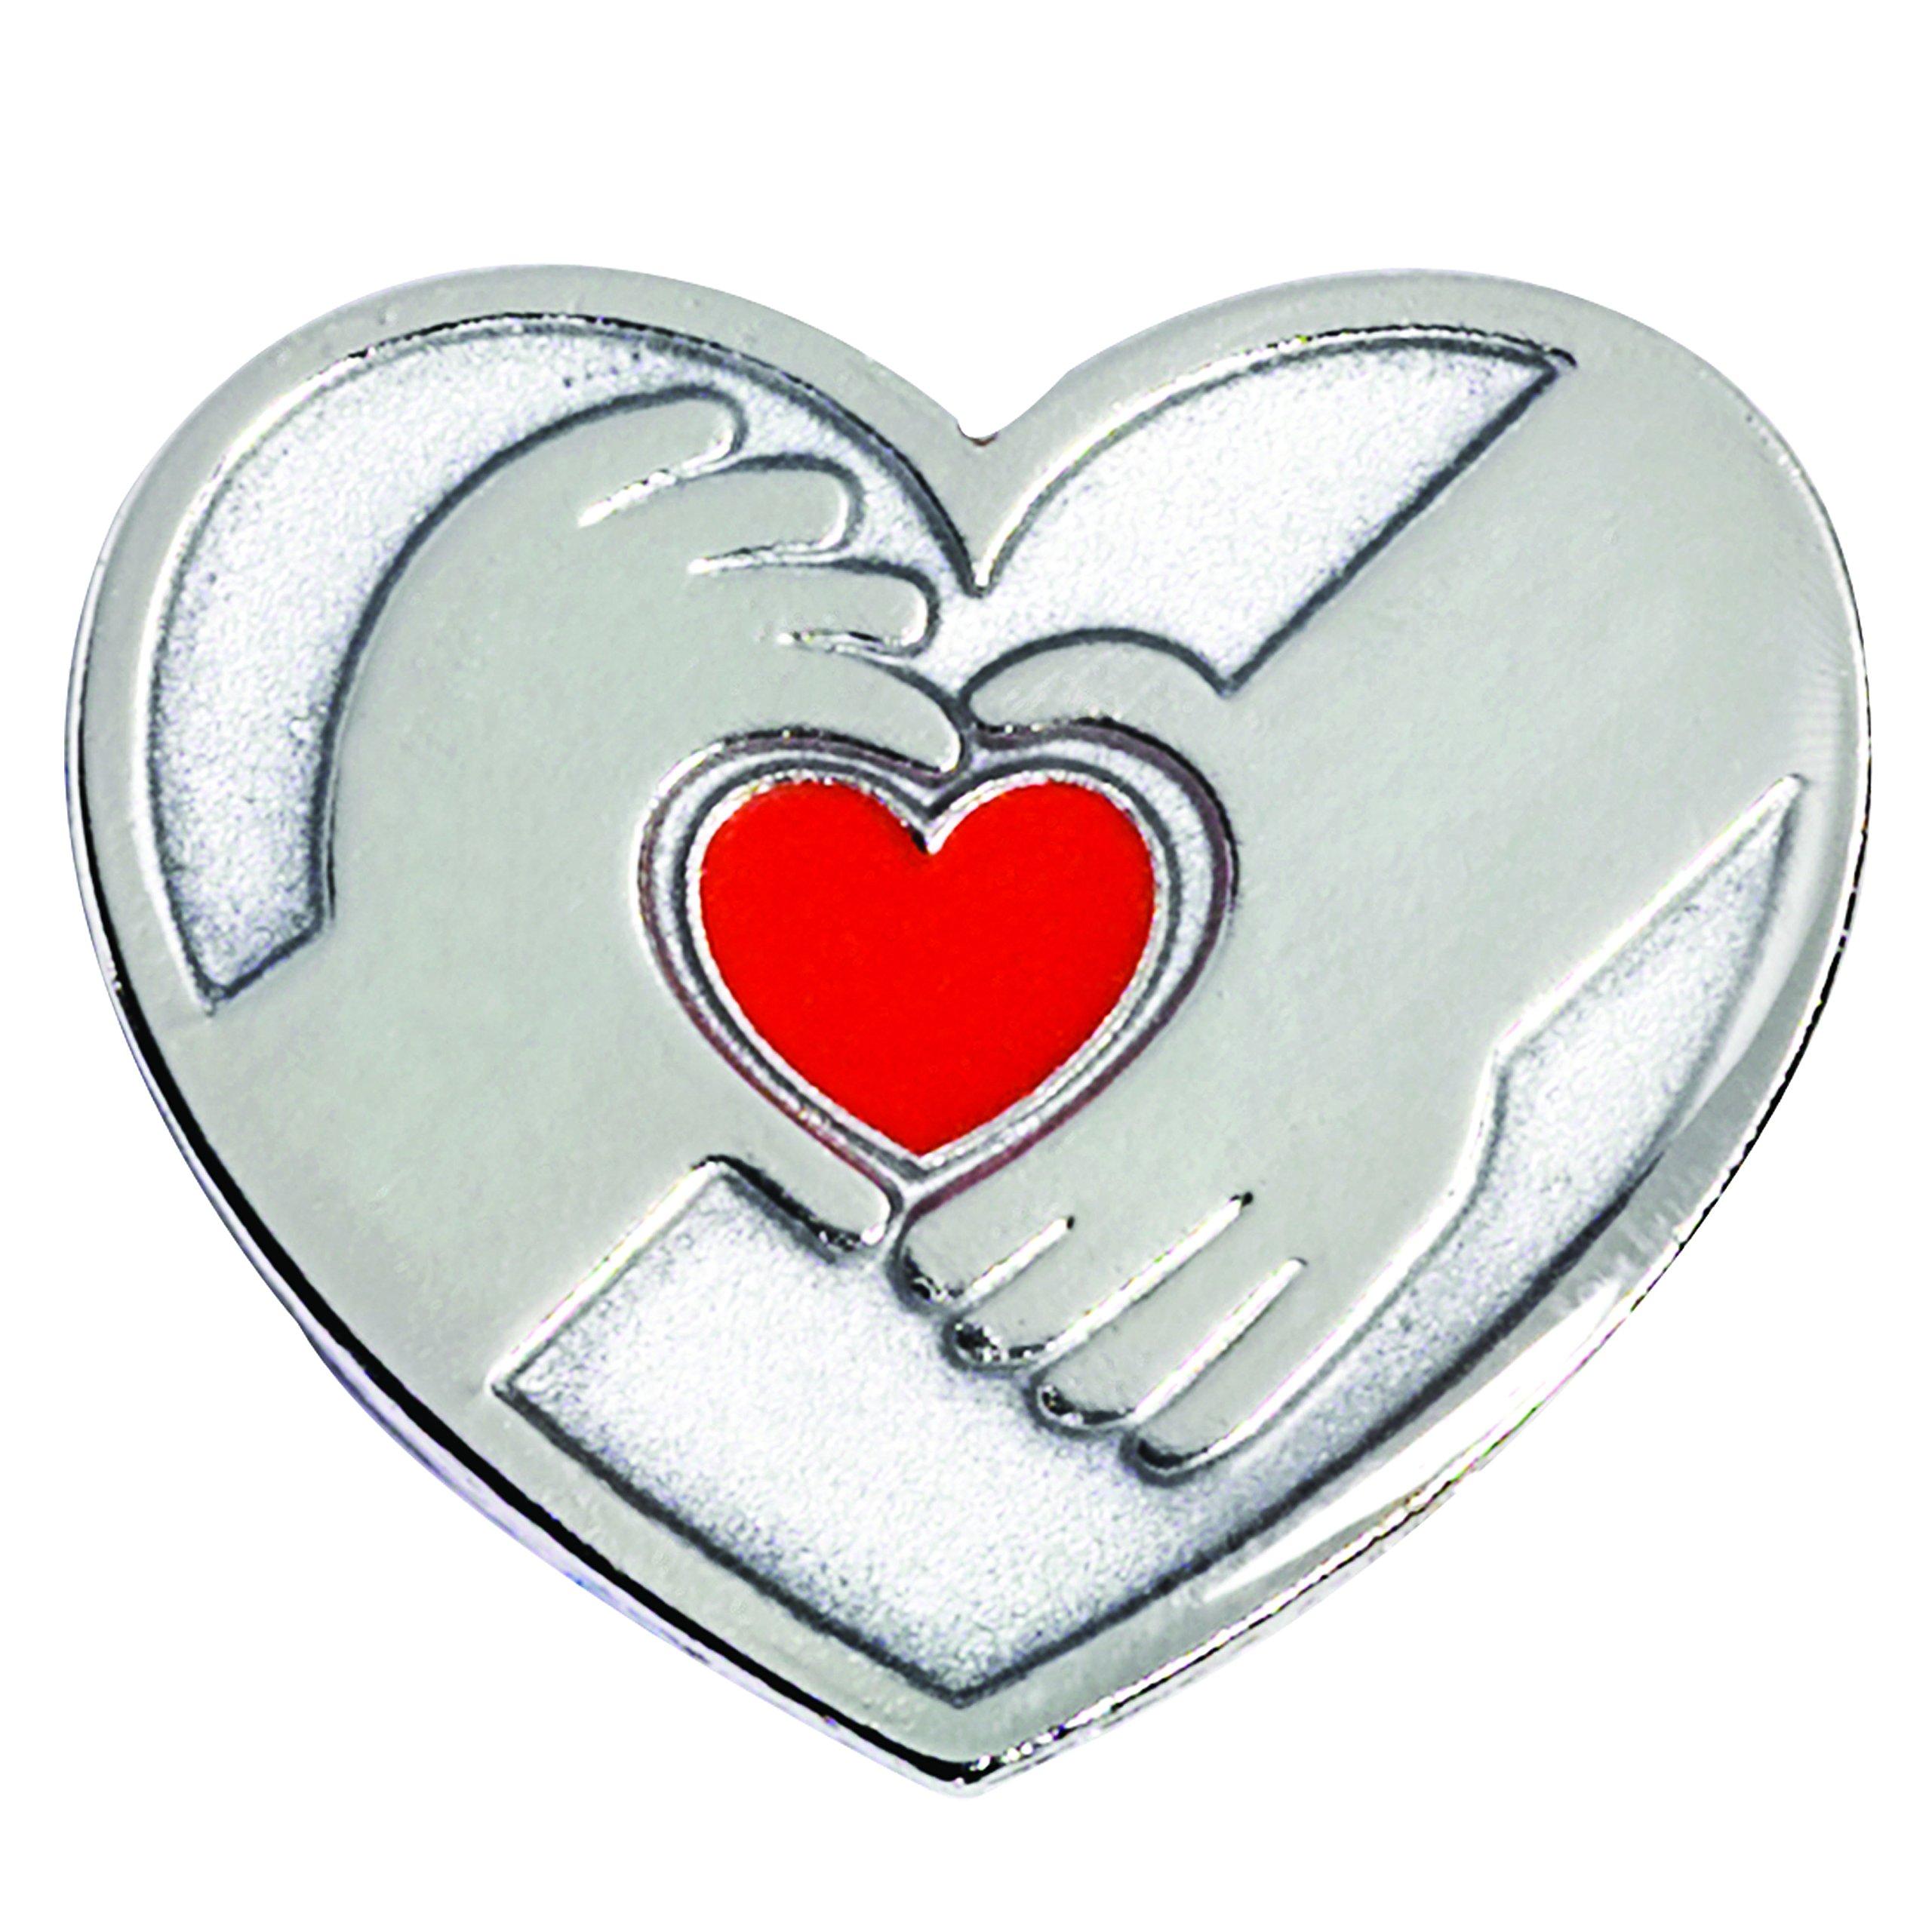 Silver Hands Holding a Red Heart Appreciation Award Lapel Pin, 12 Pins